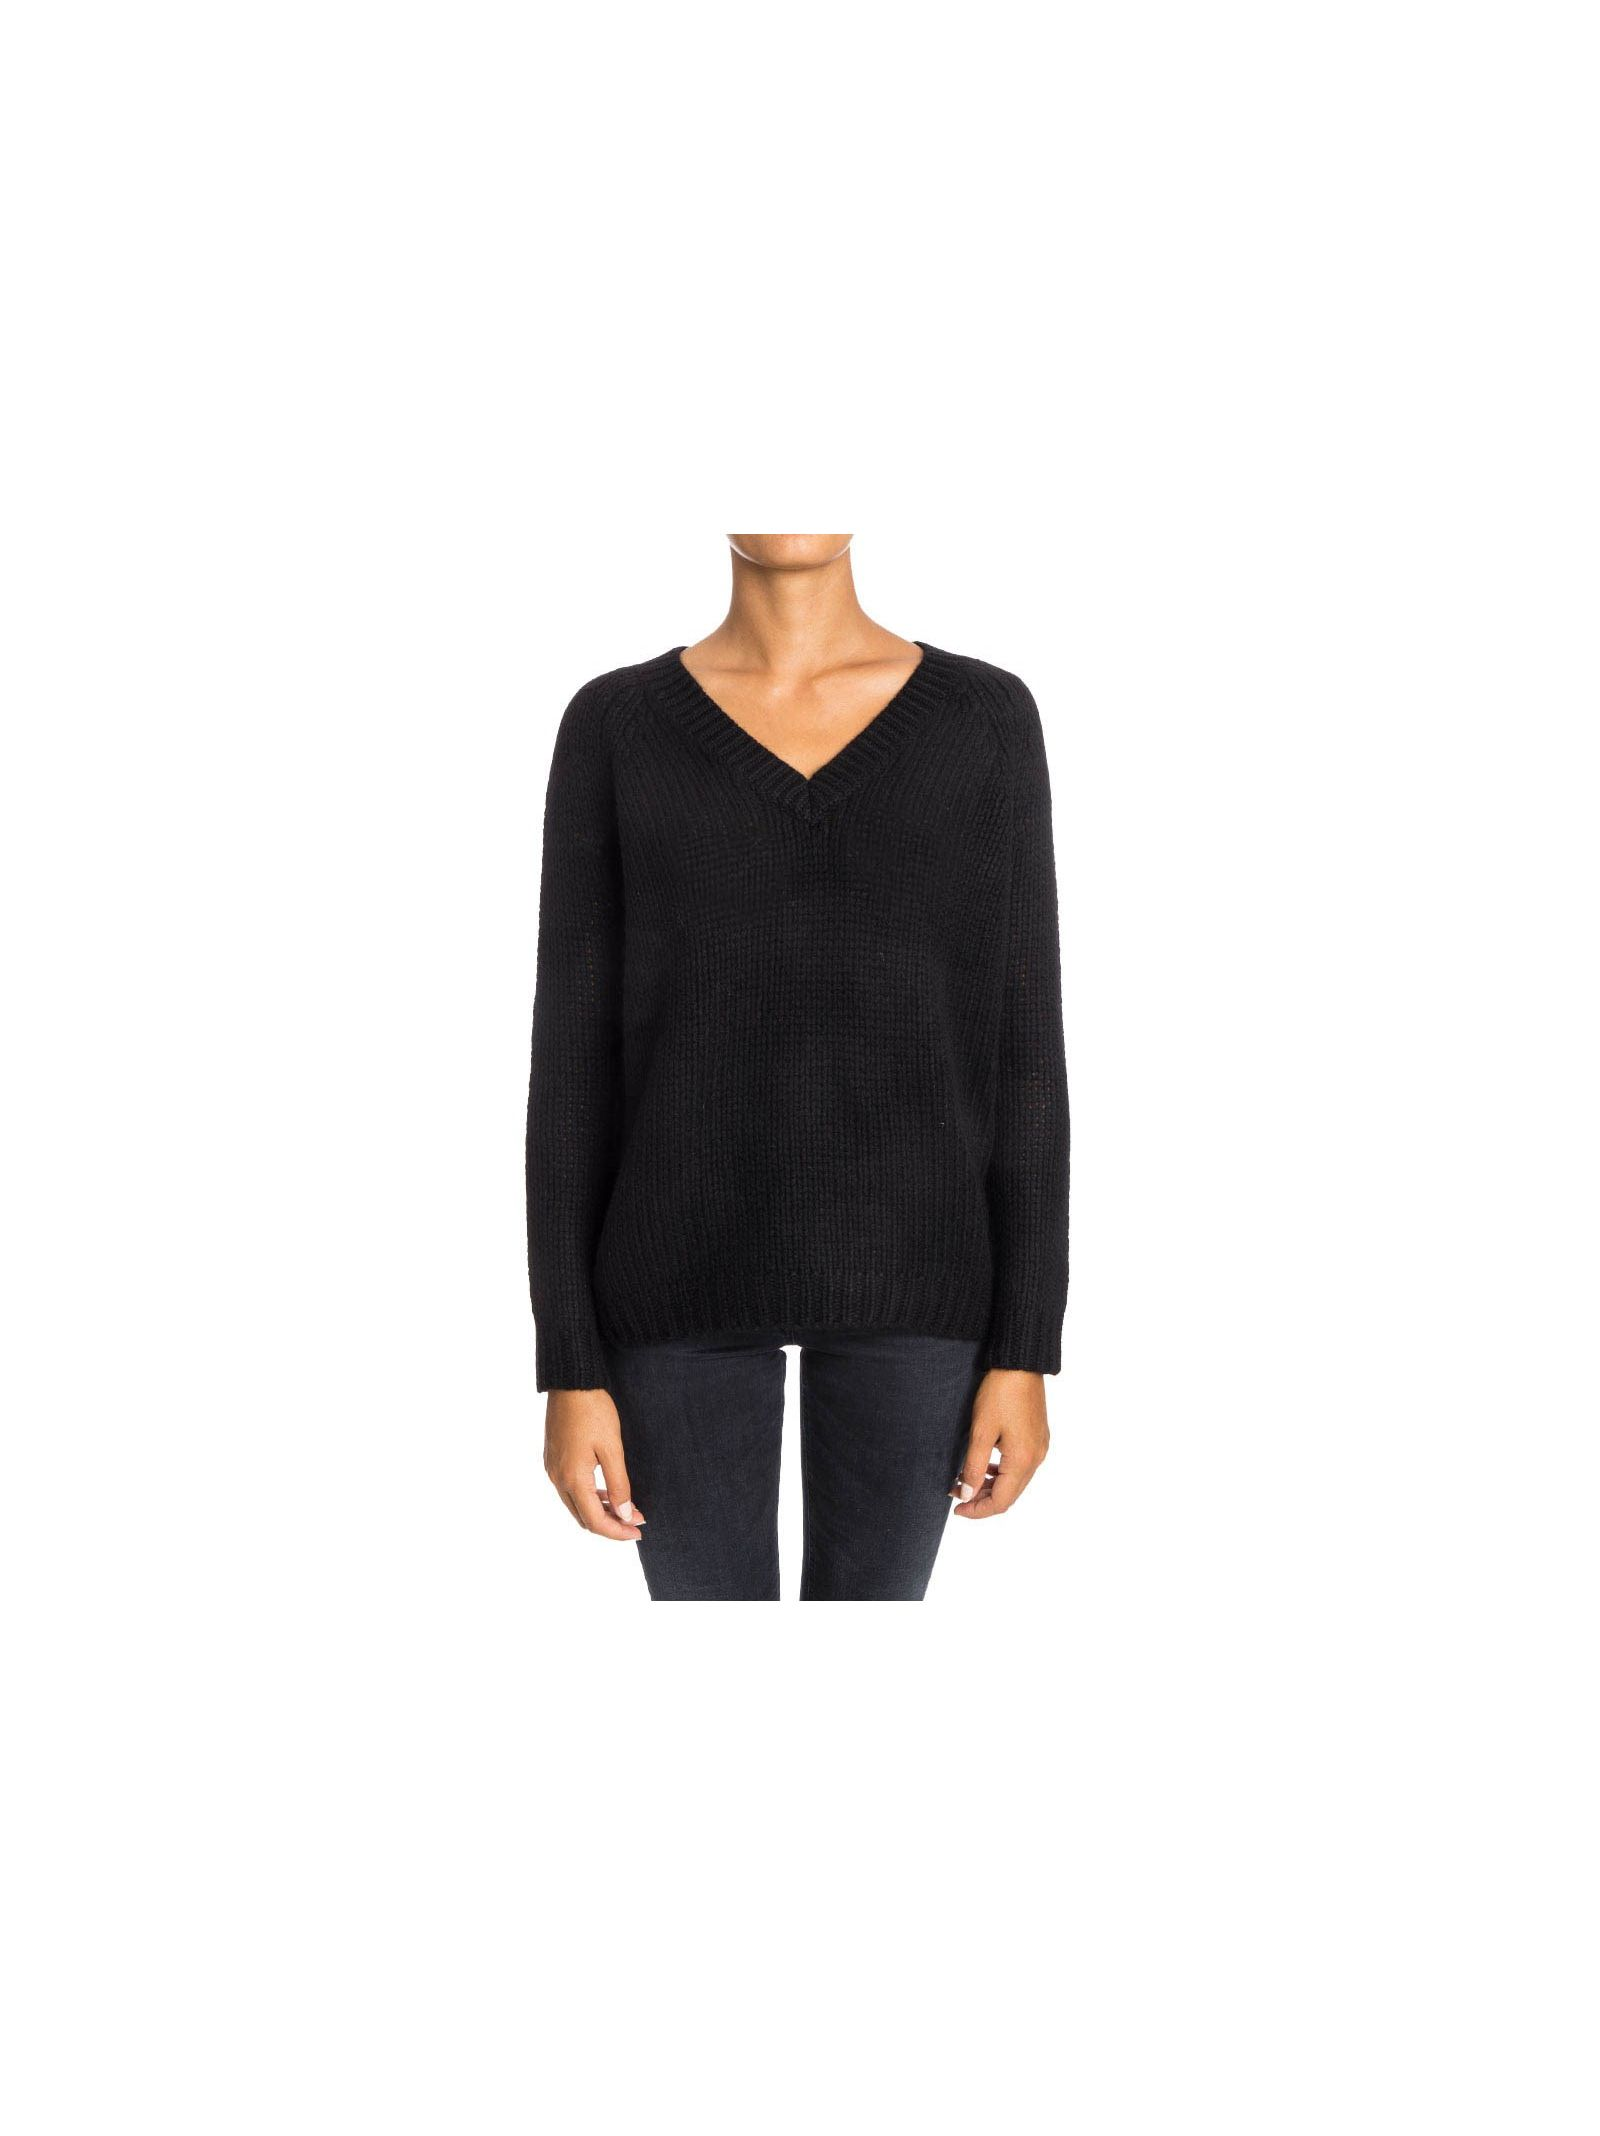 360 Cashmere - Cachemire Sweater - Brogan